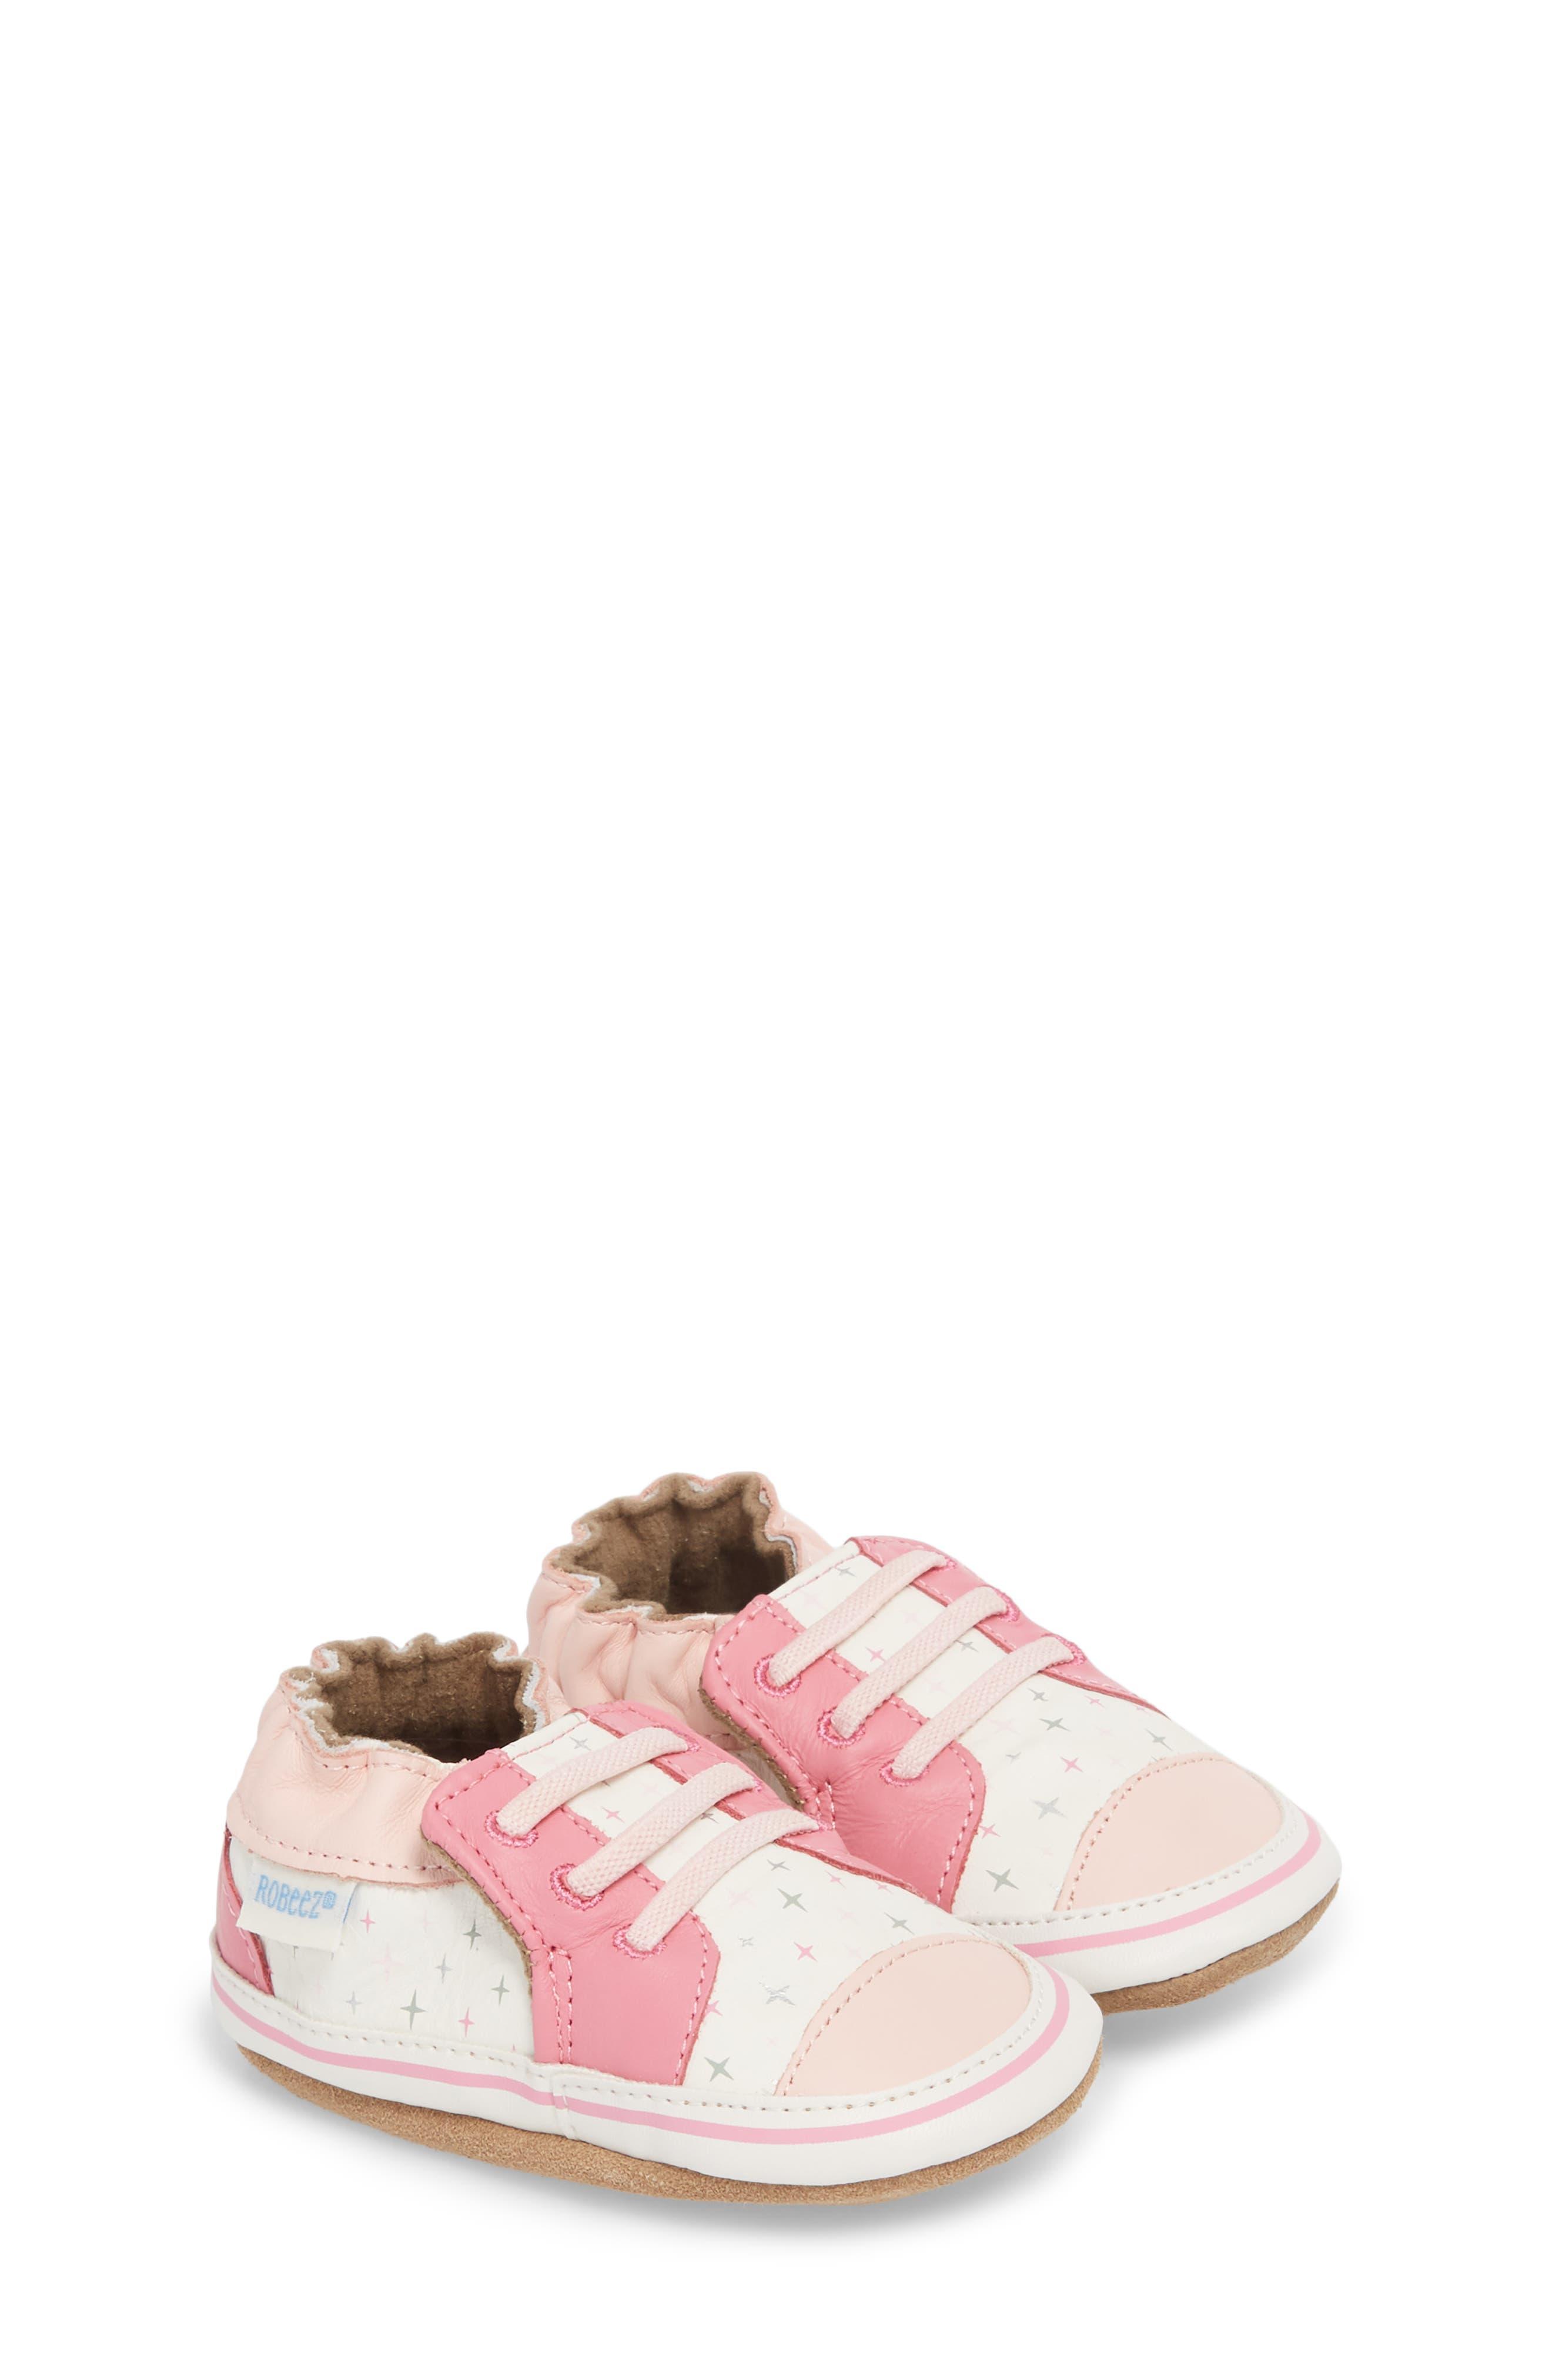 Alternate Image 3  - Robeez® Trendy Trainer Sneaker Crib Shoe (Baby)